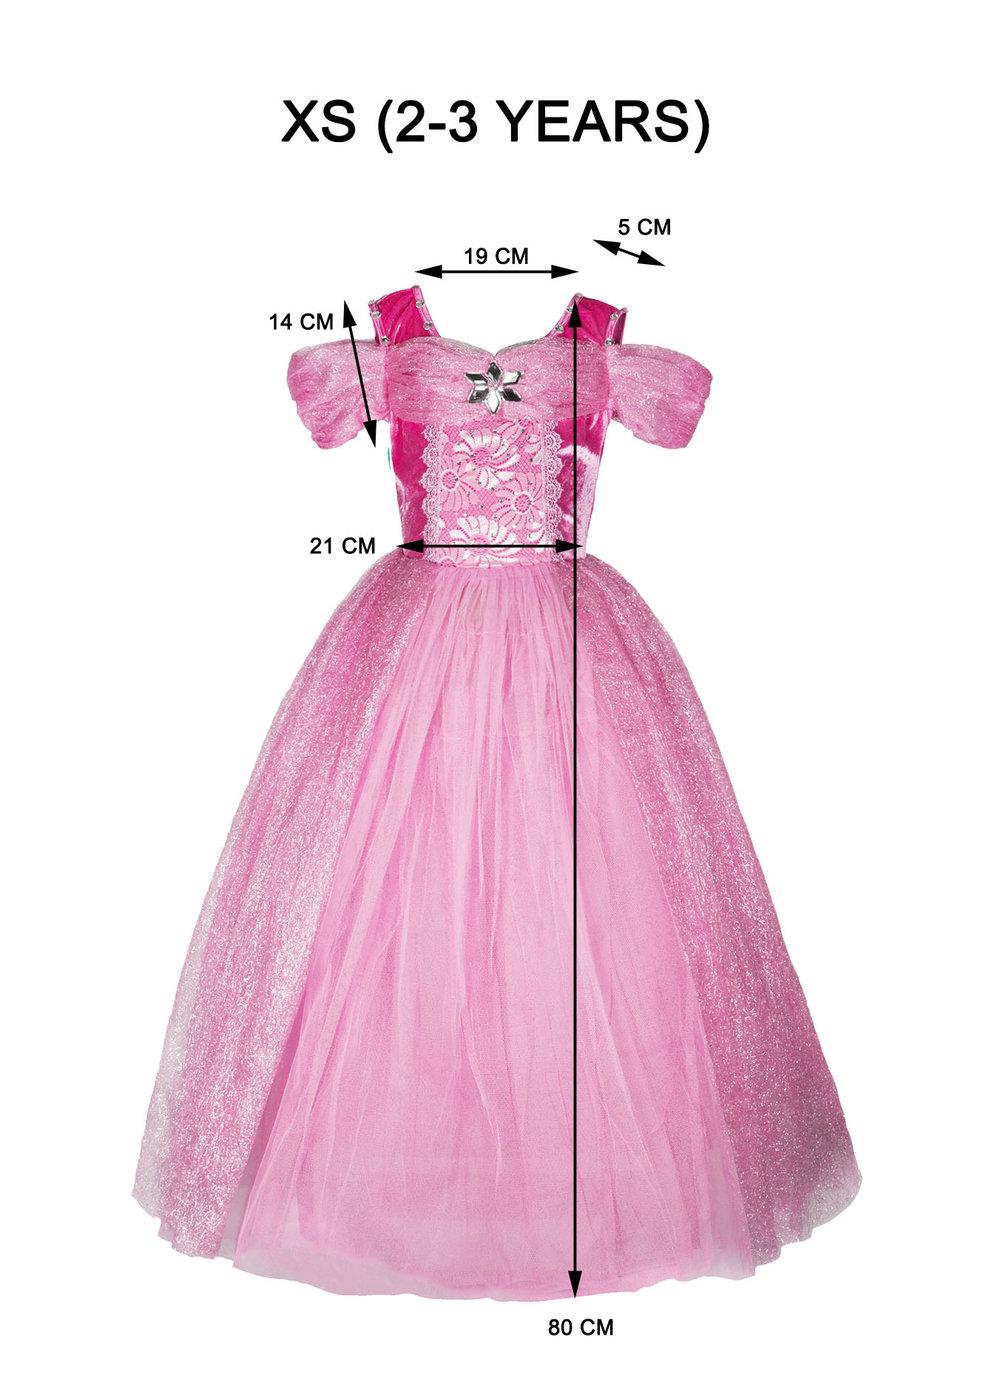 Sparkly Princess Pink XS.jpg